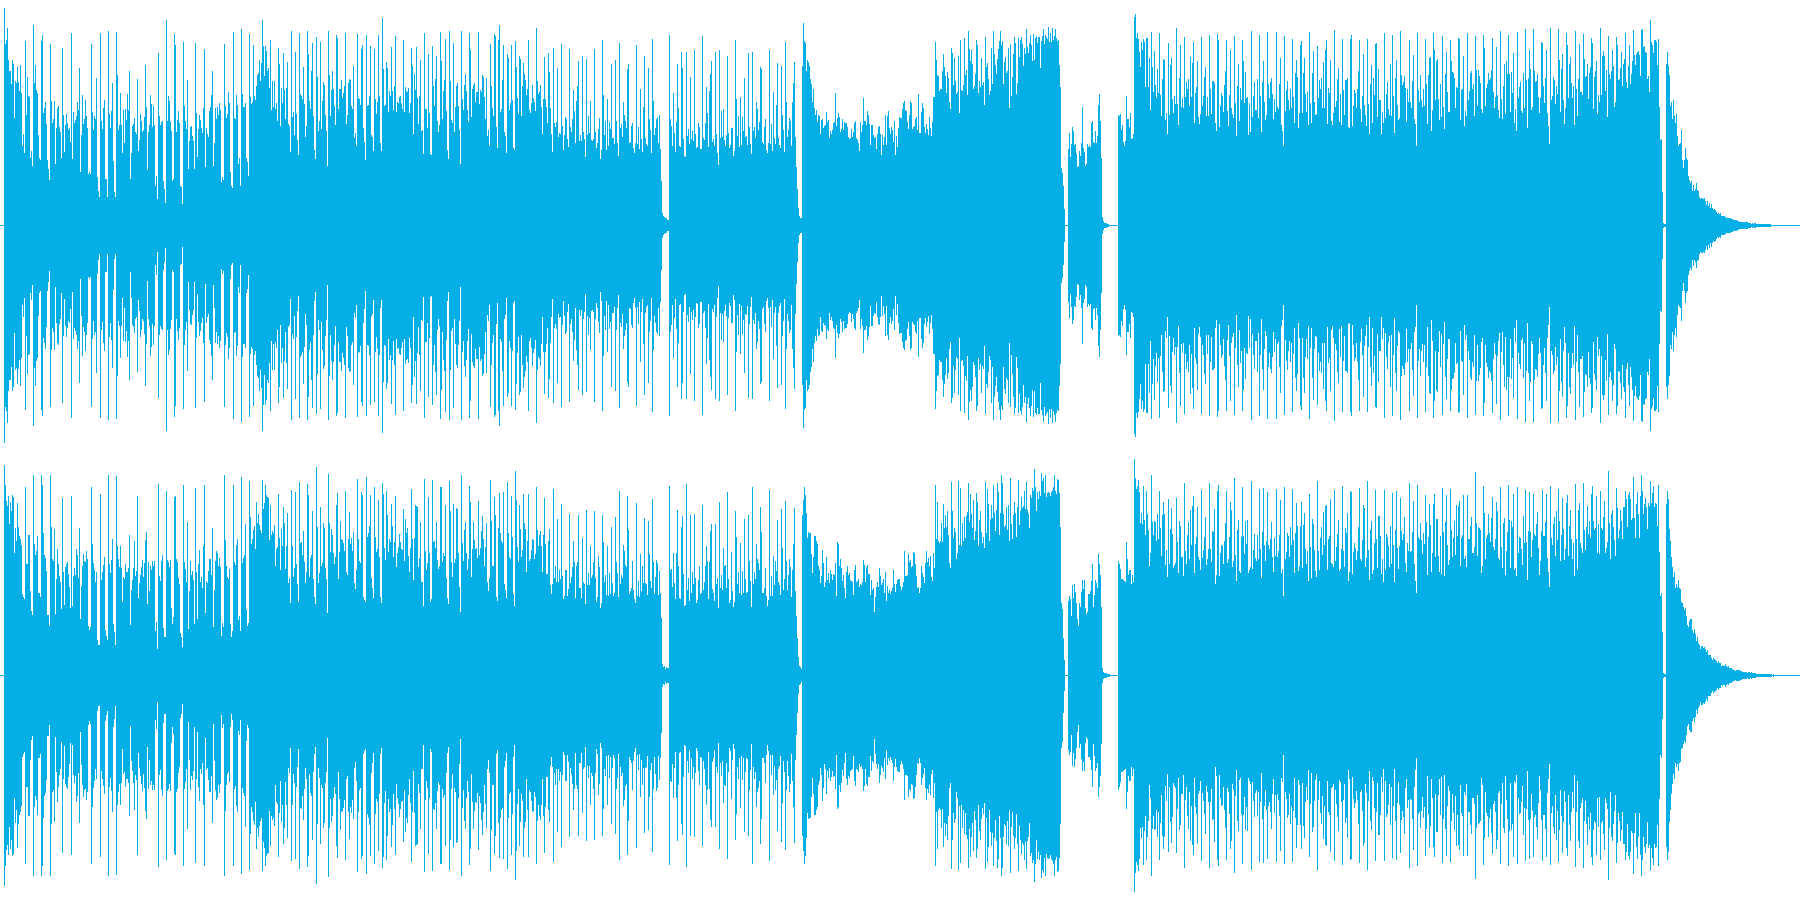 EDM オープニング スポーツ イベントの再生済みの波形